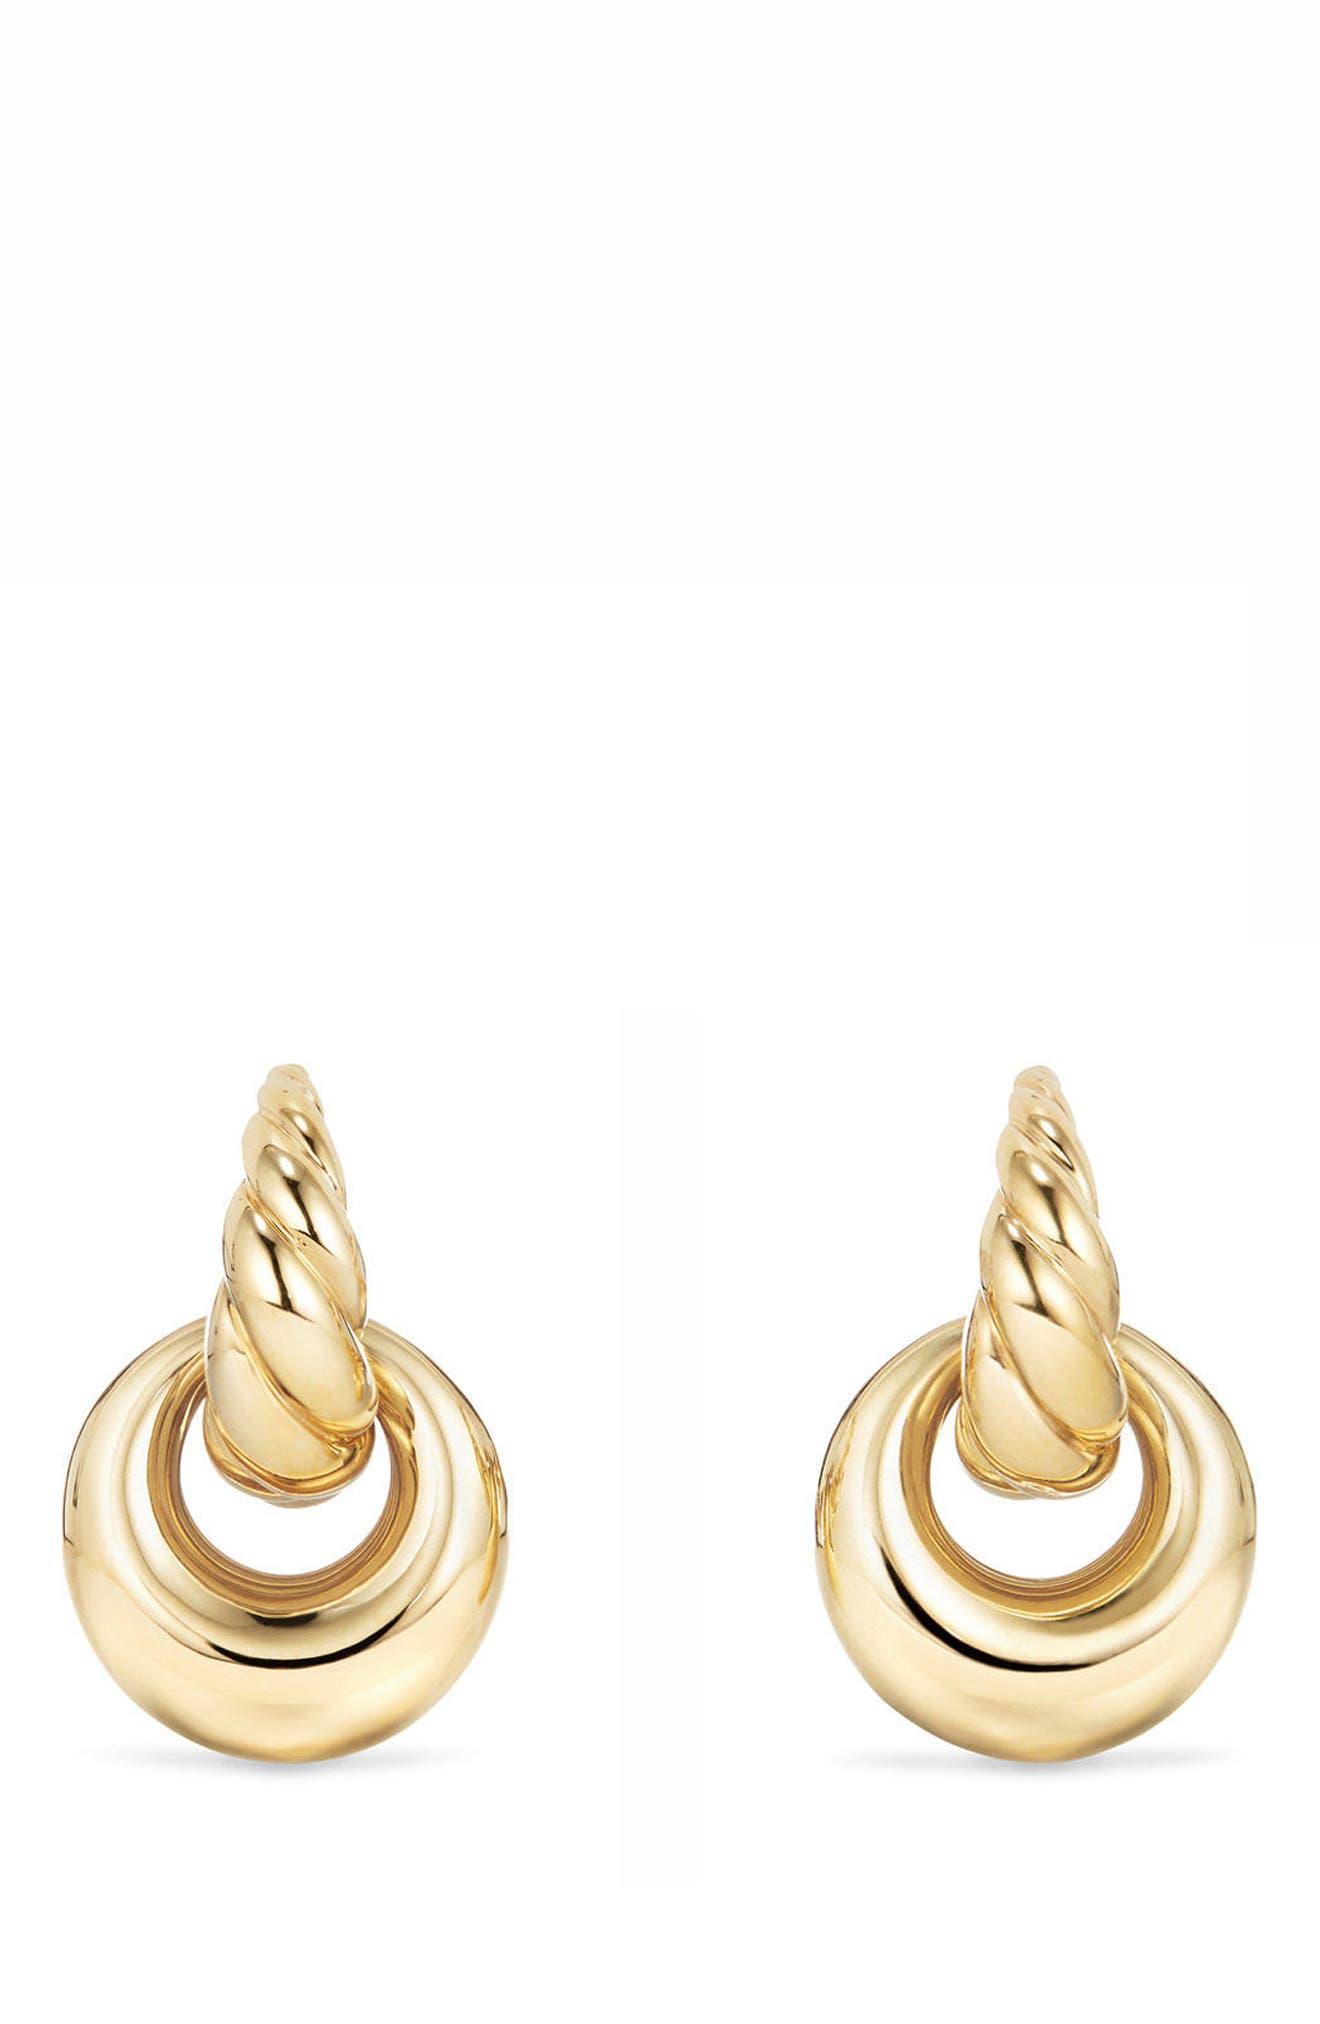 DAVID YURMAN, Pure Form<sup>®</sup> Drop Earrings in 18K Yellow Gold, Main thumbnail 1, color, YELLOW GOLD